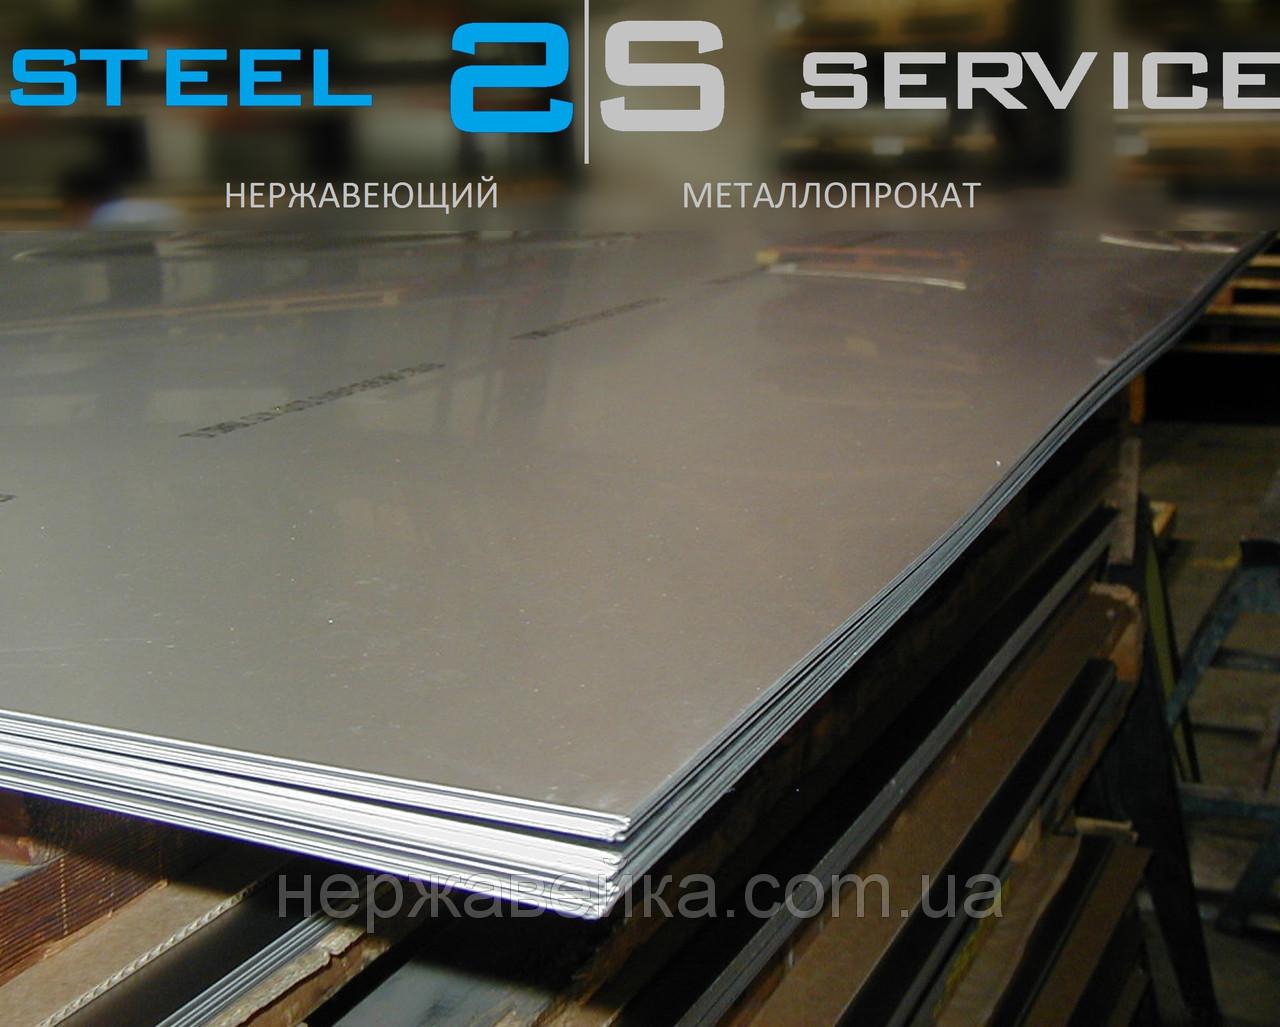 Нержавейка лист 10х1500х3000мм  AISI 316Ti(10Х17Н13М2Т) F1 - горячекатанный,  кислотостойкий